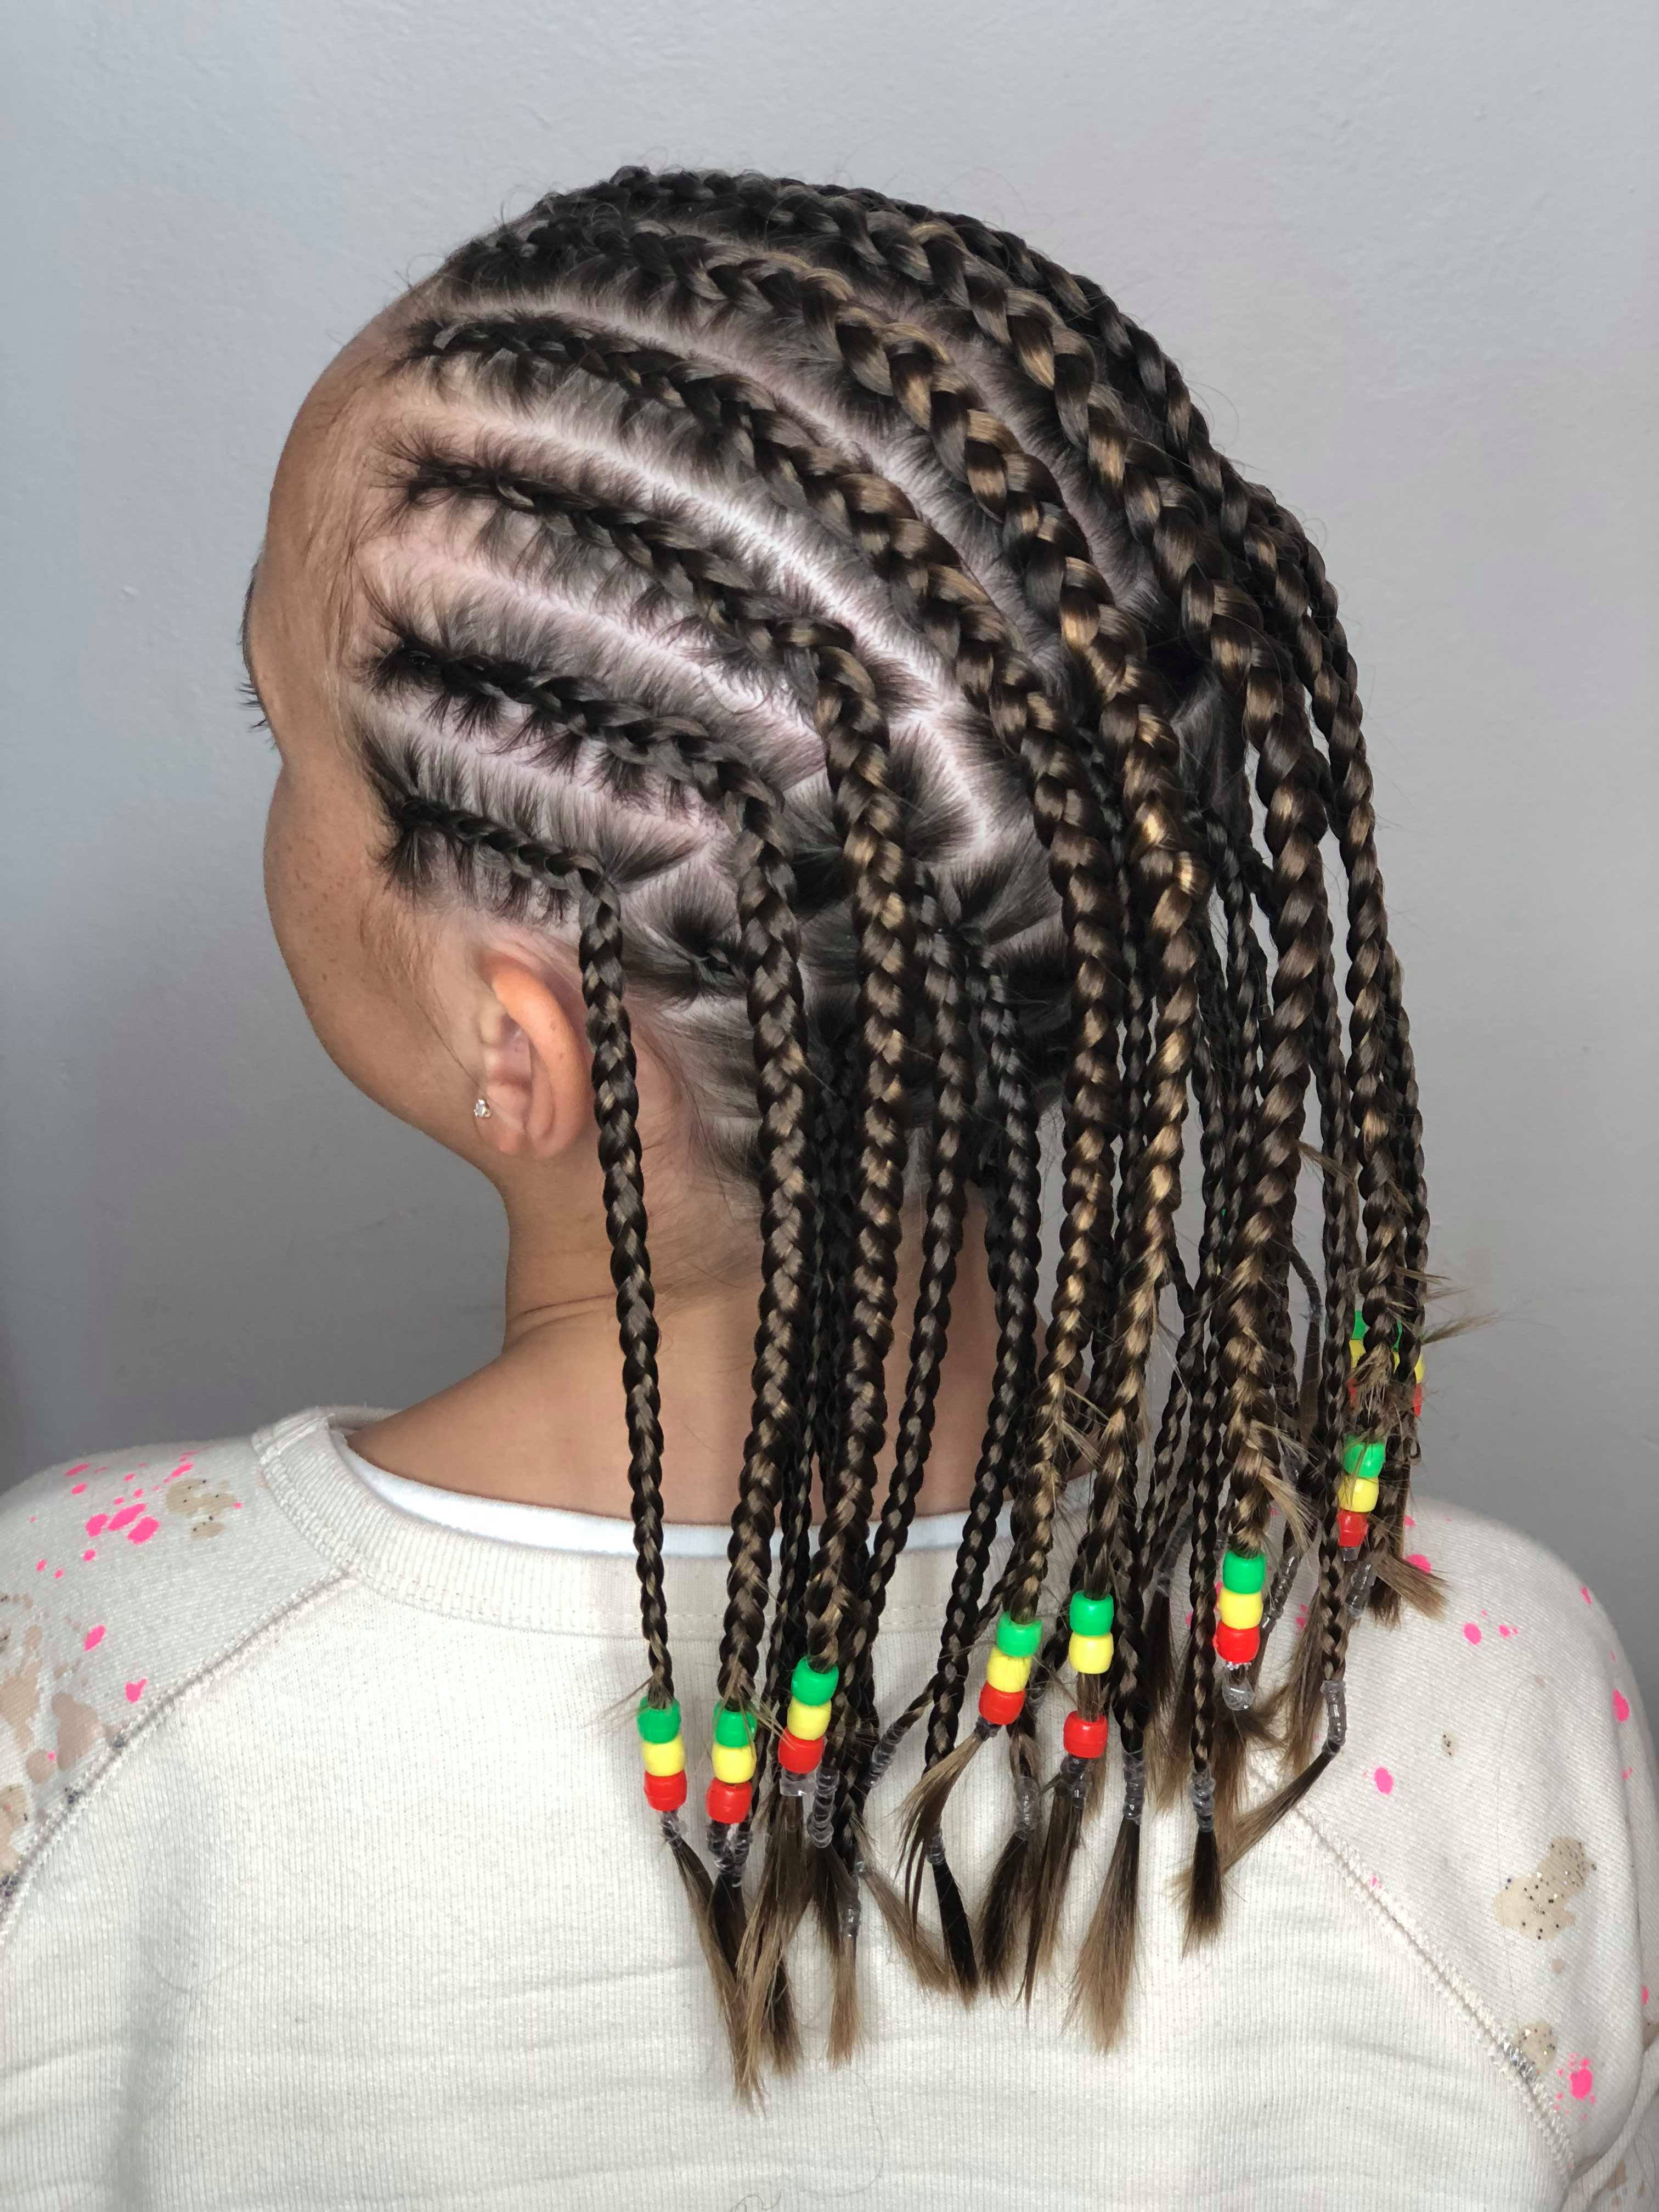 Bali braids NO ext